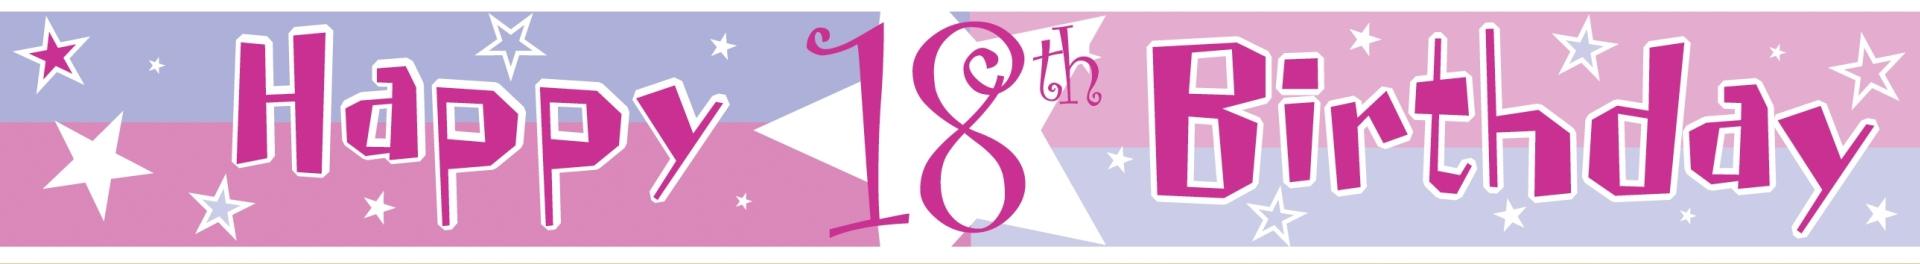 banner girlande pink zahl 18 geburtstag party deko ebay. Black Bedroom Furniture Sets. Home Design Ideas